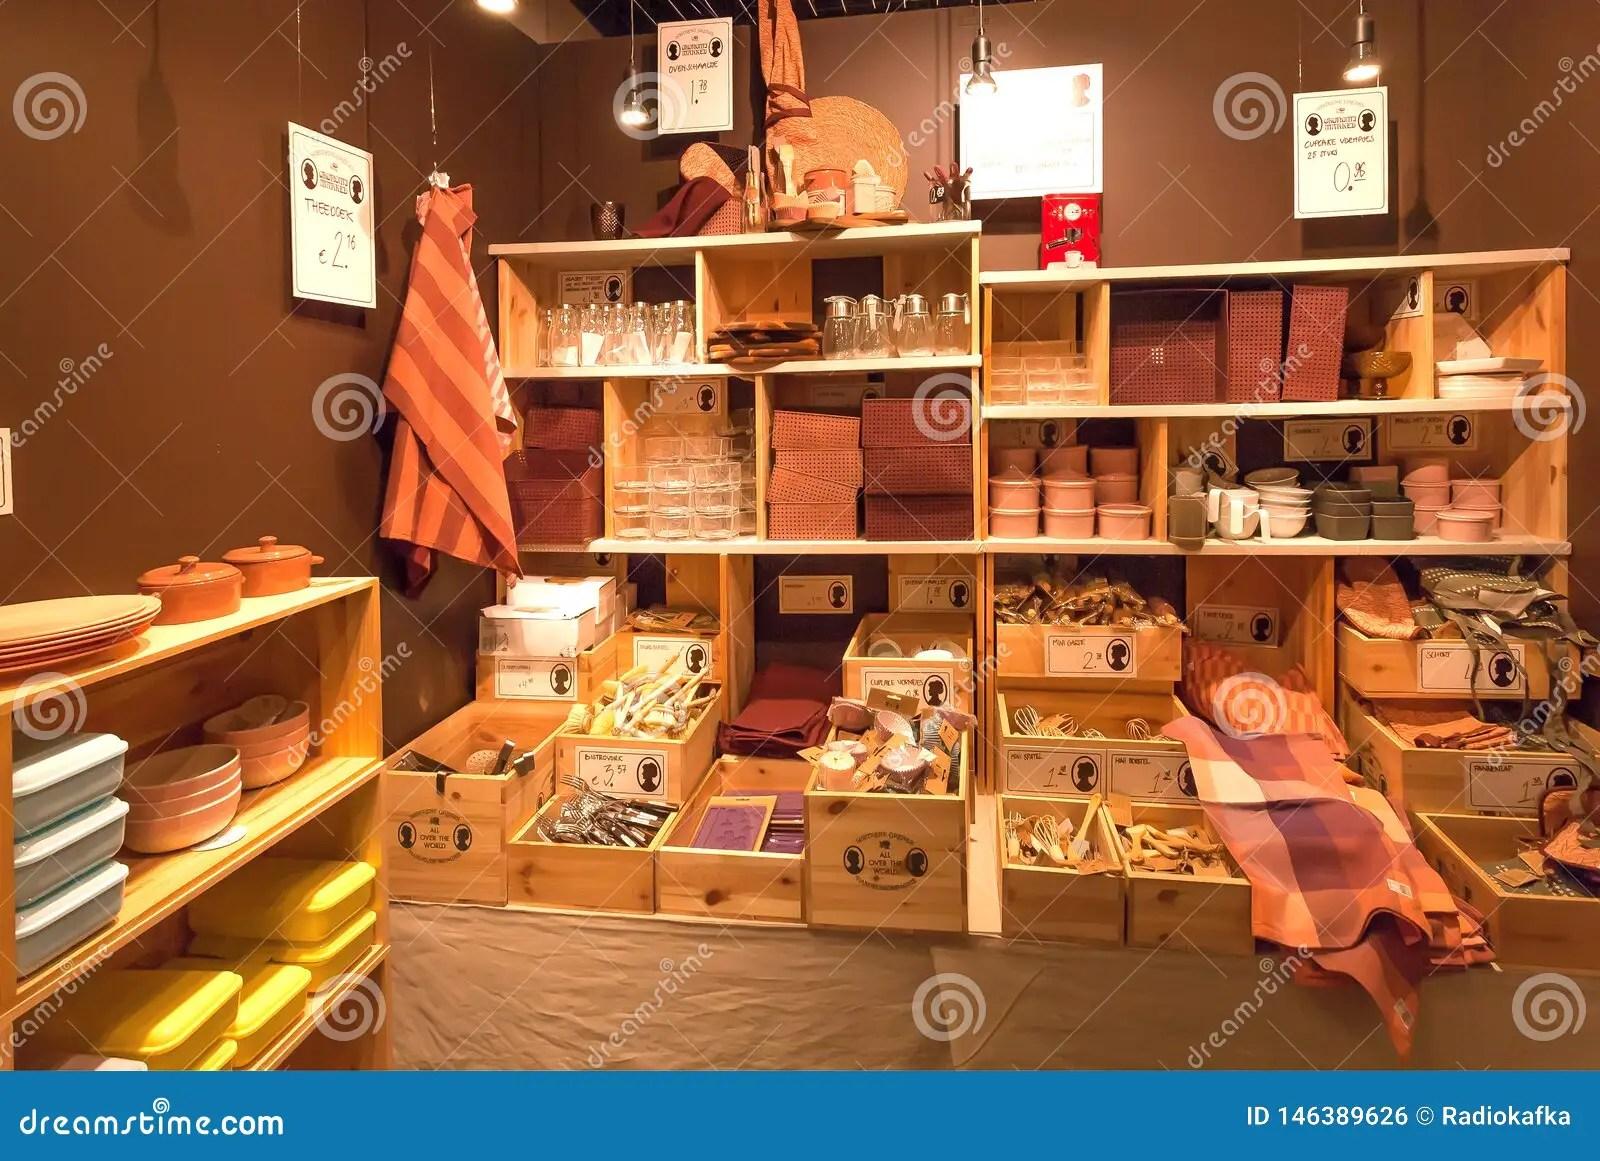 Home Decor Stores Netherlands